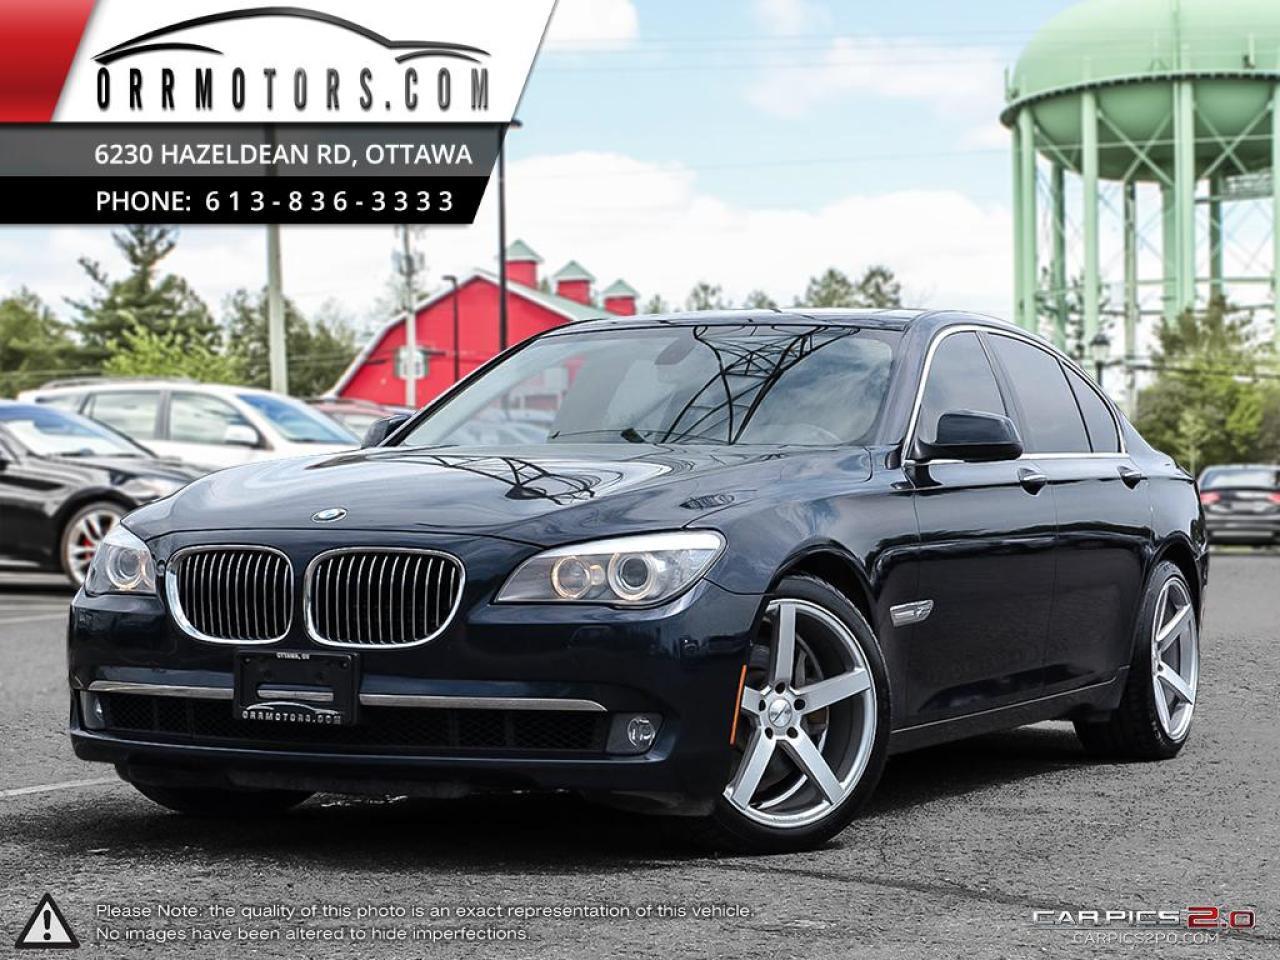 2012 BMW 750i 750i xDrive Sedan